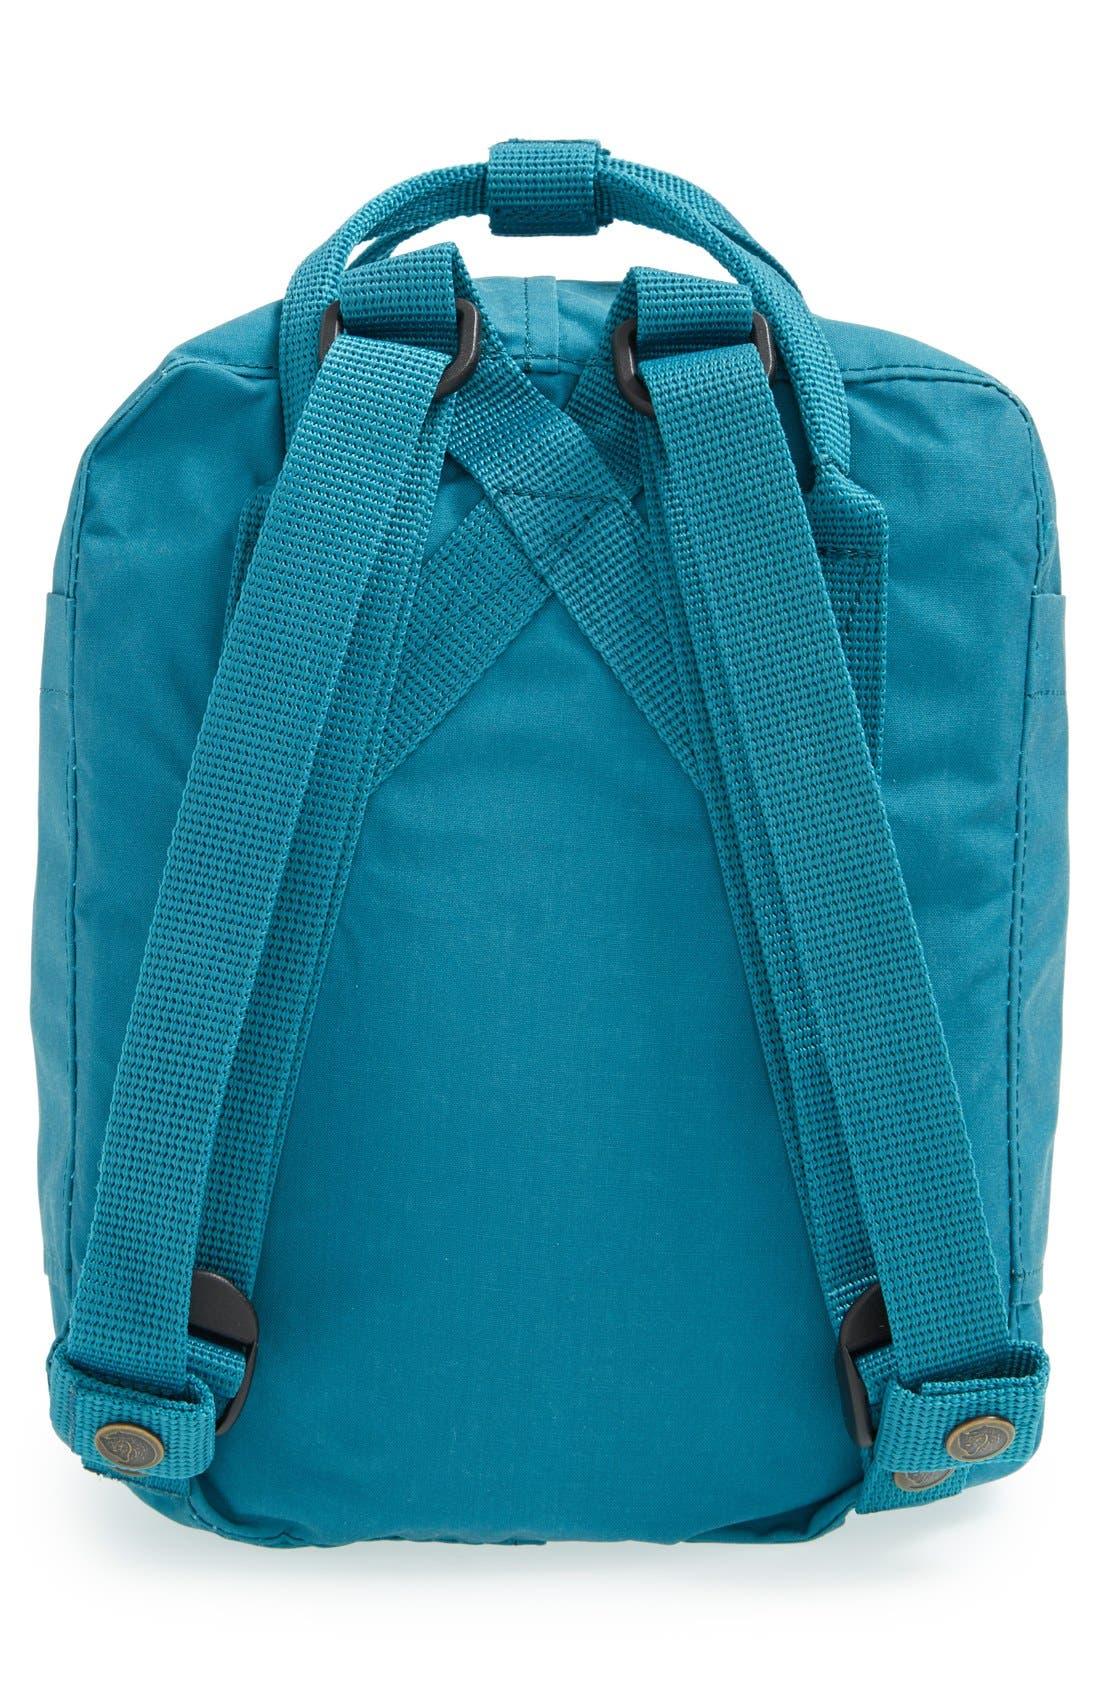 'Mini Kånken' Water Resistant Backpack,                             Alternate thumbnail 4, color,                             OCEAN GREEN